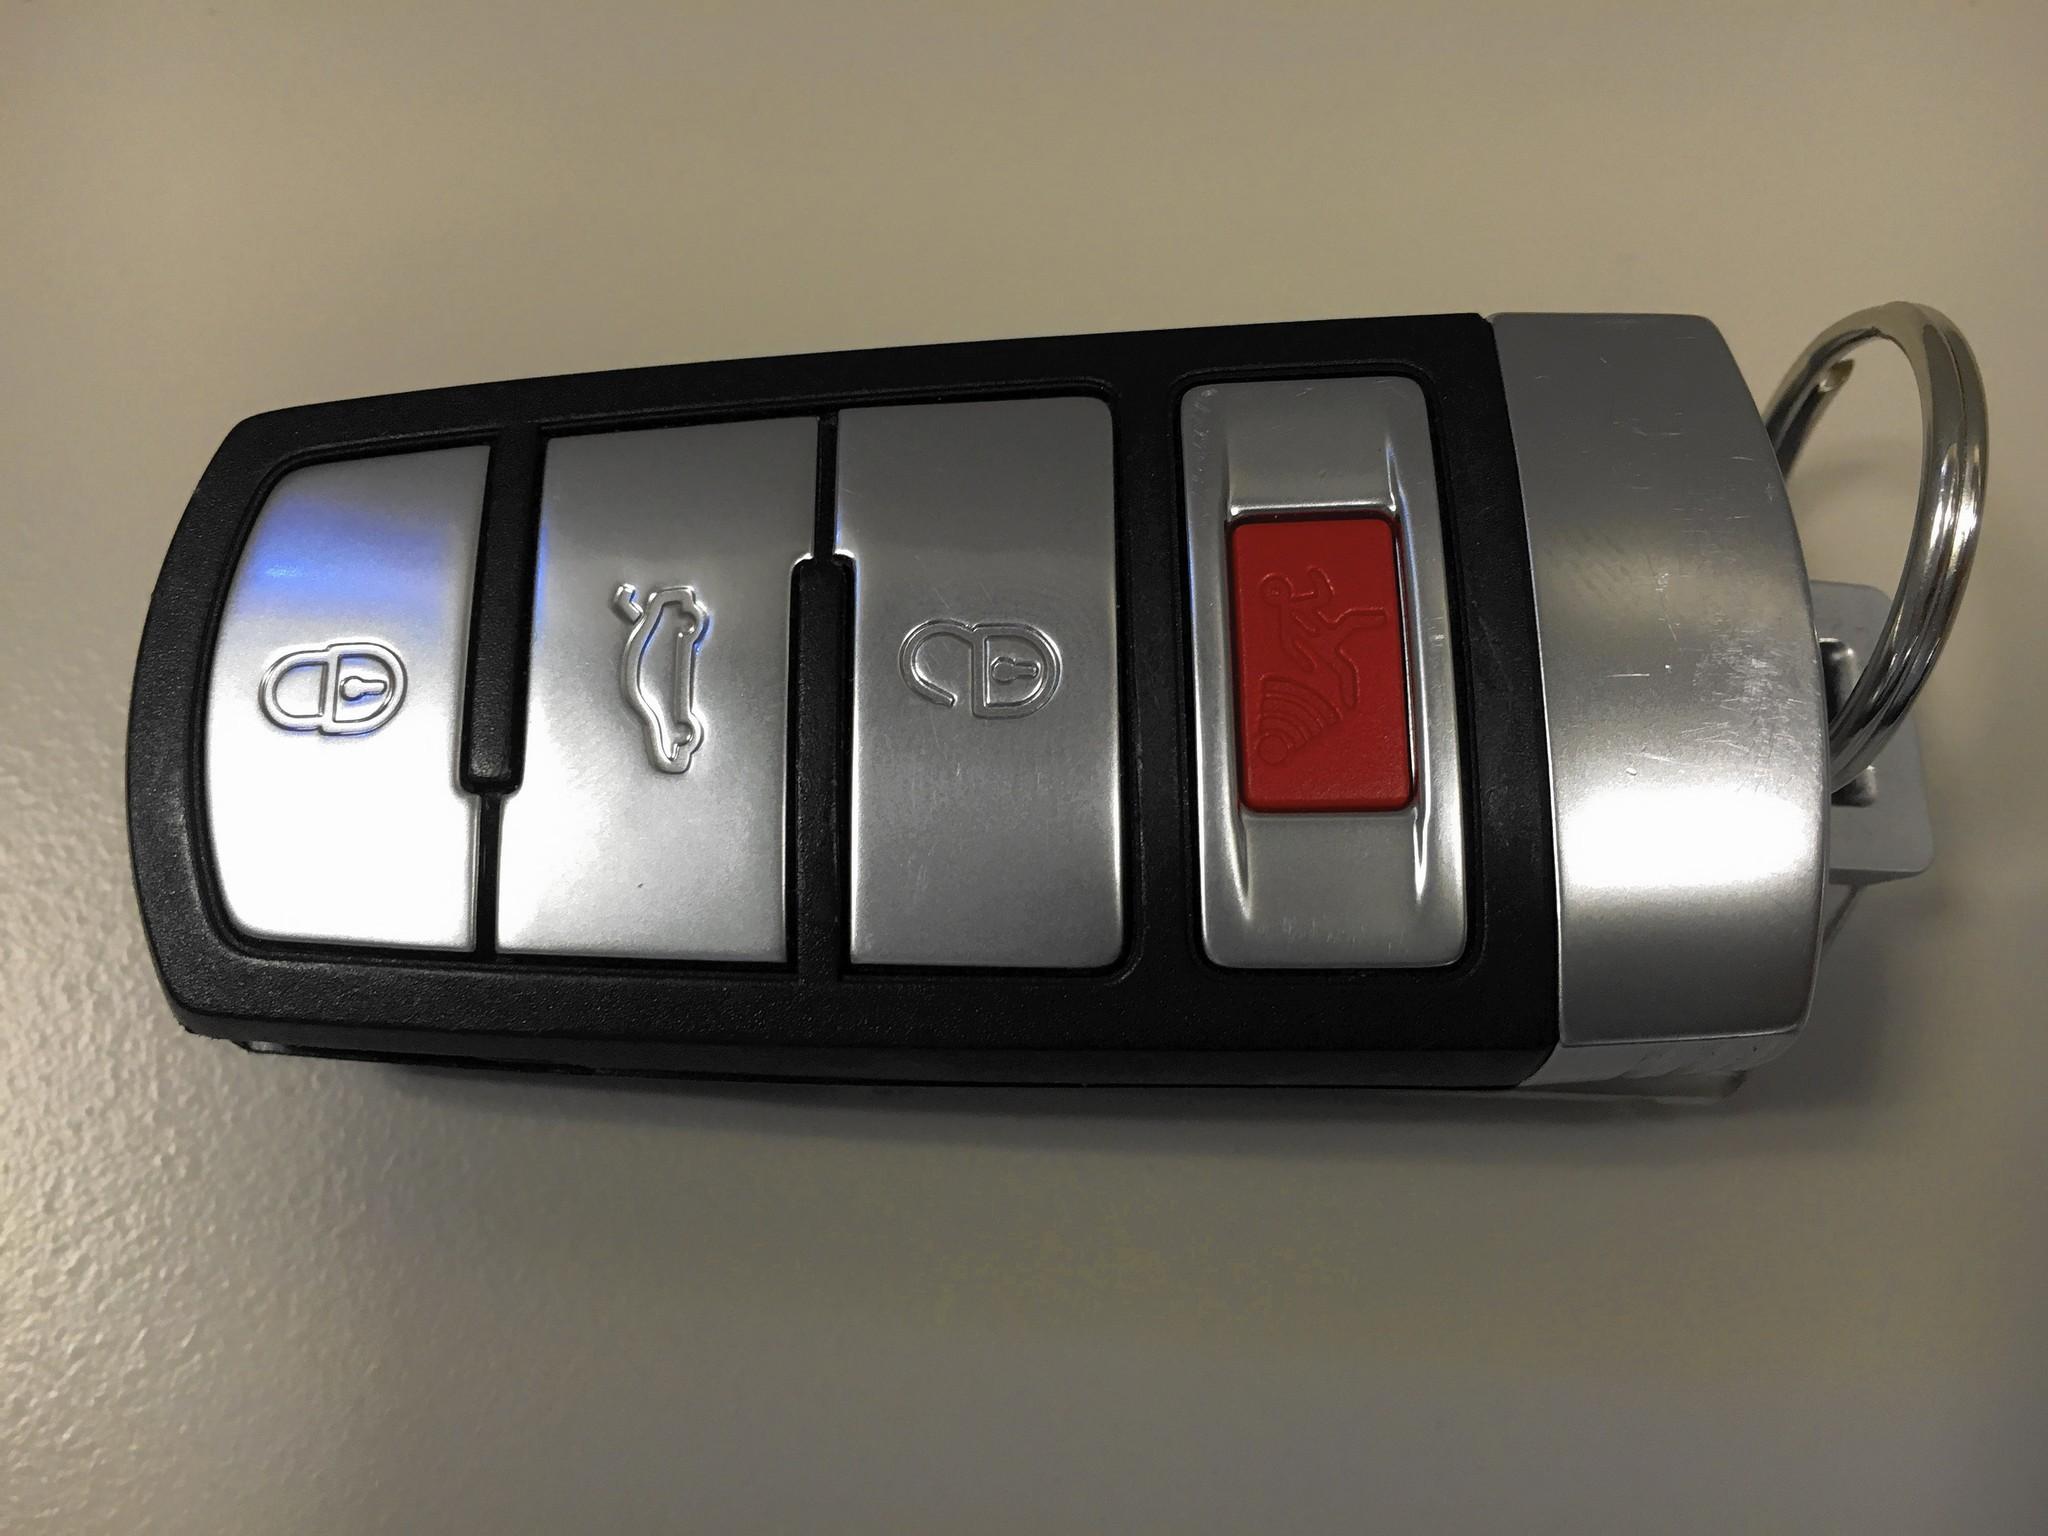 Key fob, electronics drain car batteries